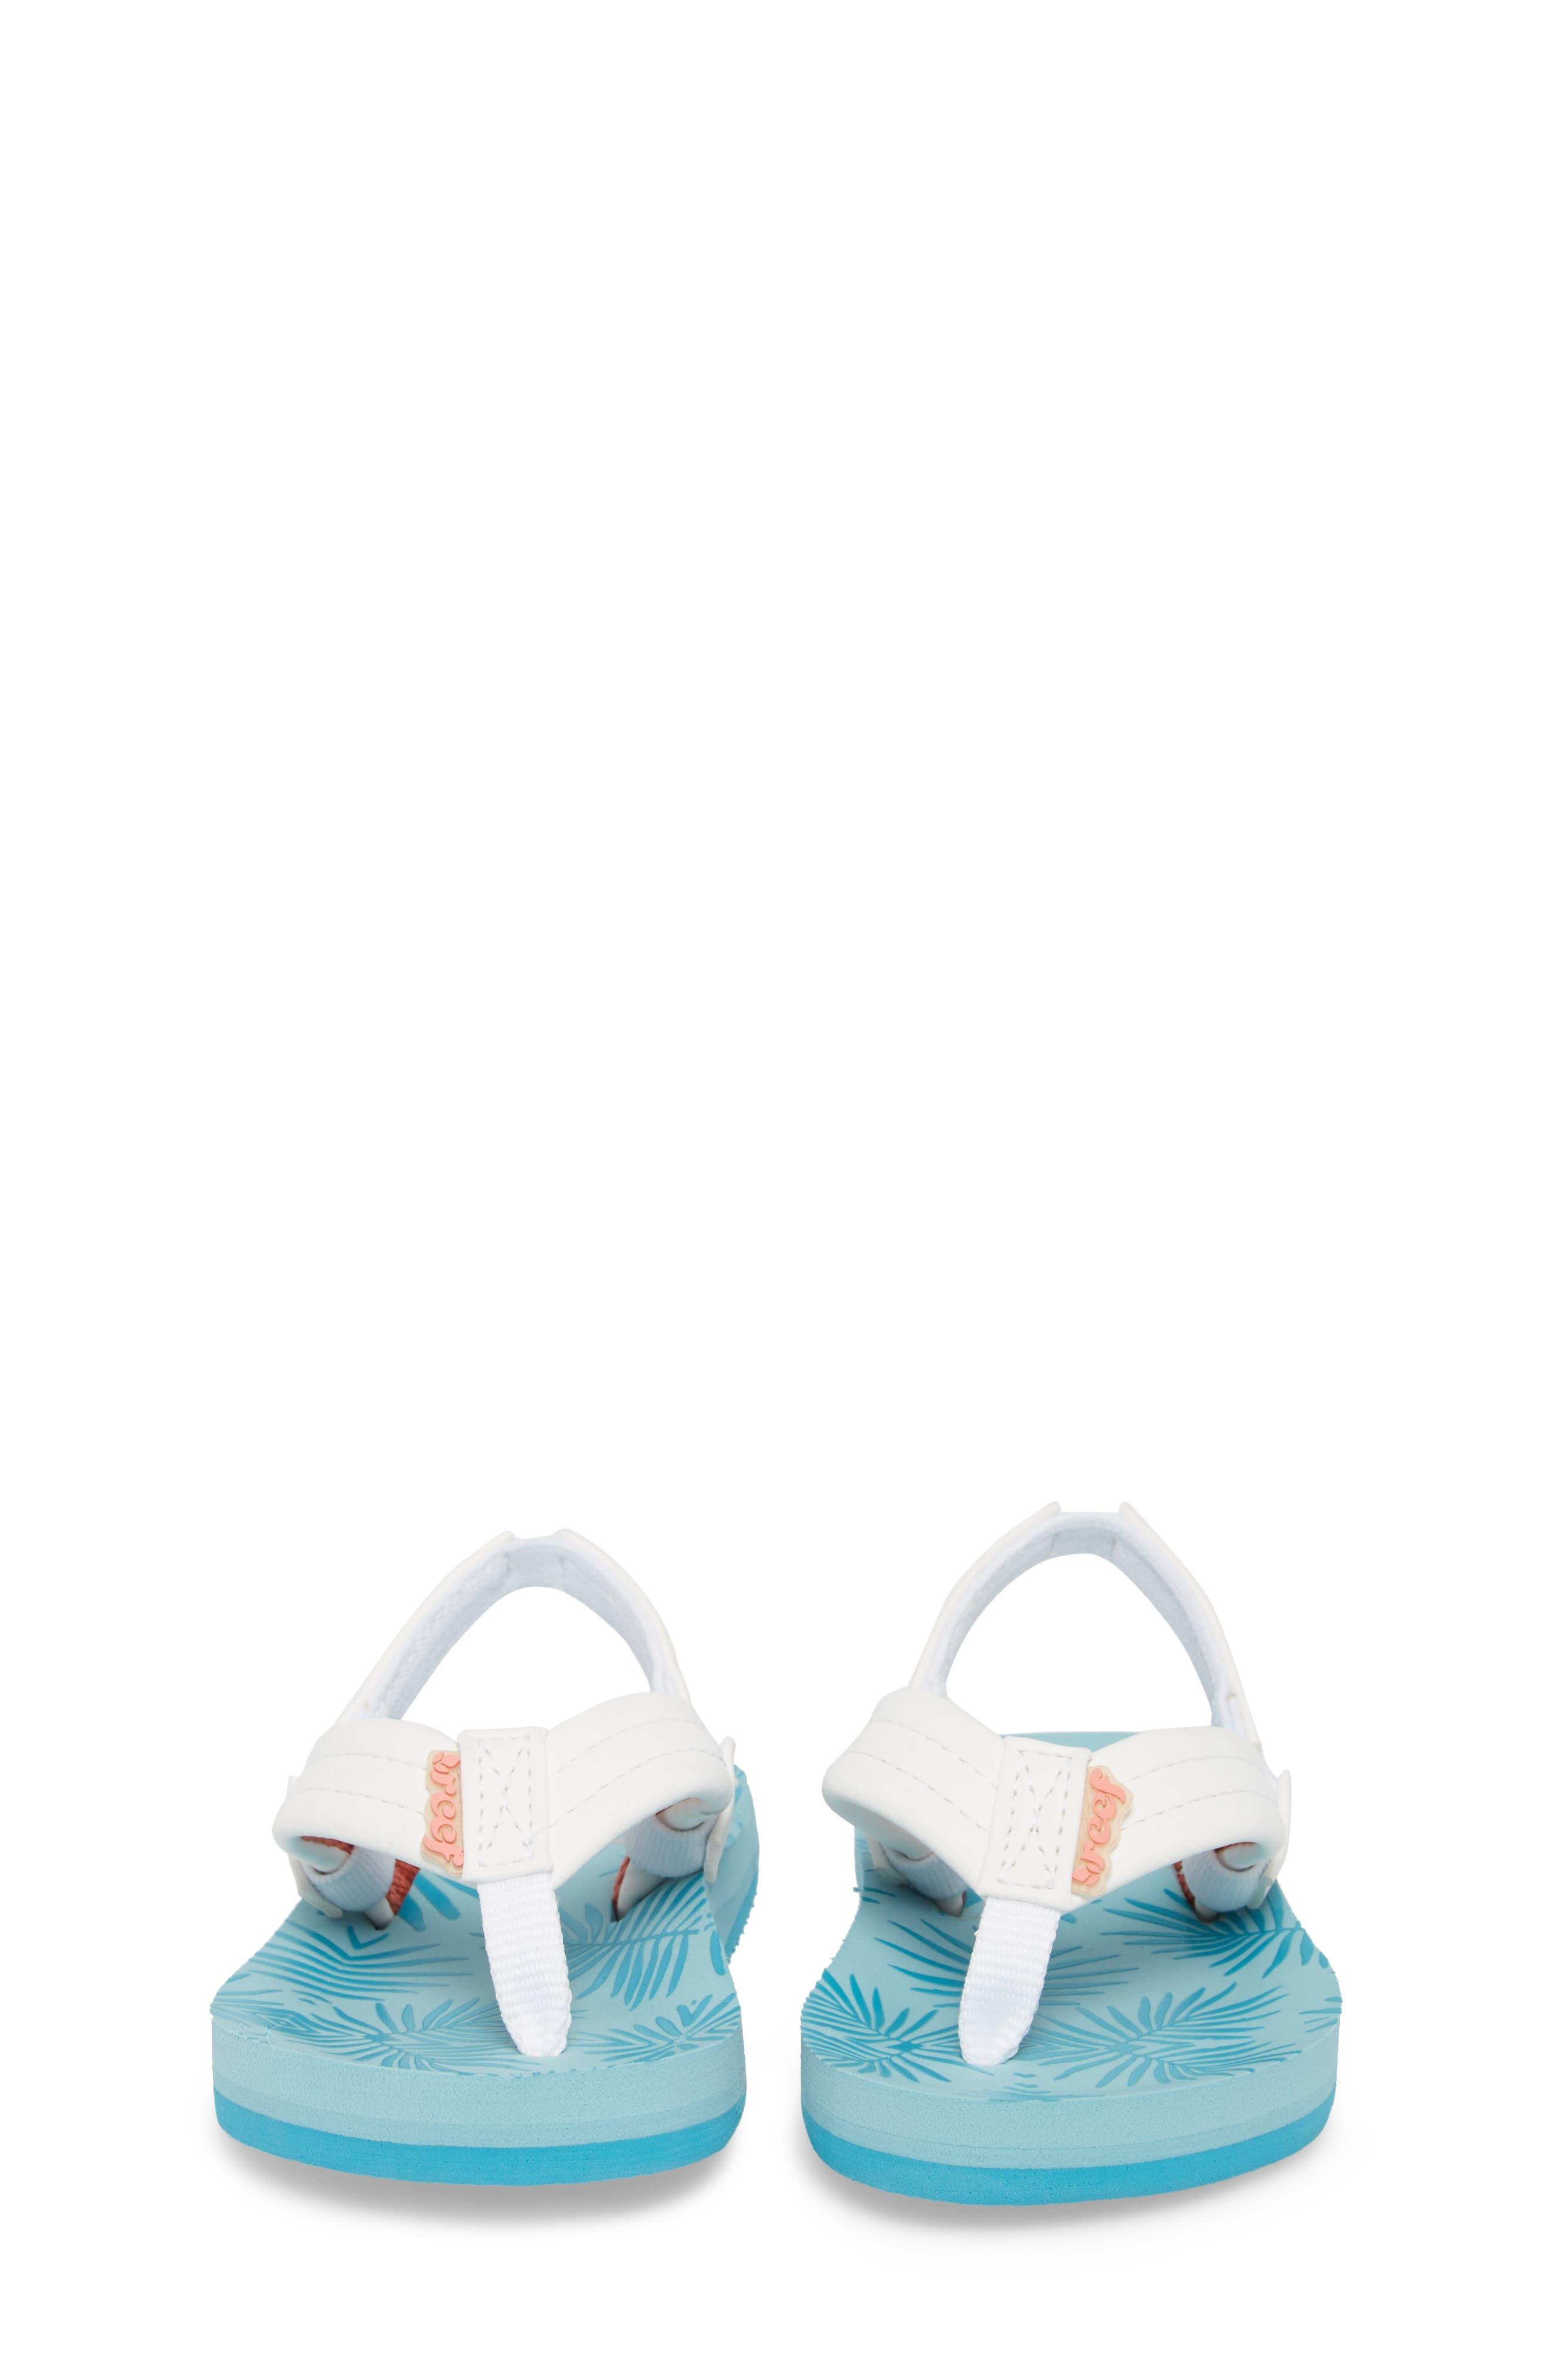 Little Reef Footprints Sandal,                             Alternate thumbnail 5, color,                             Blue